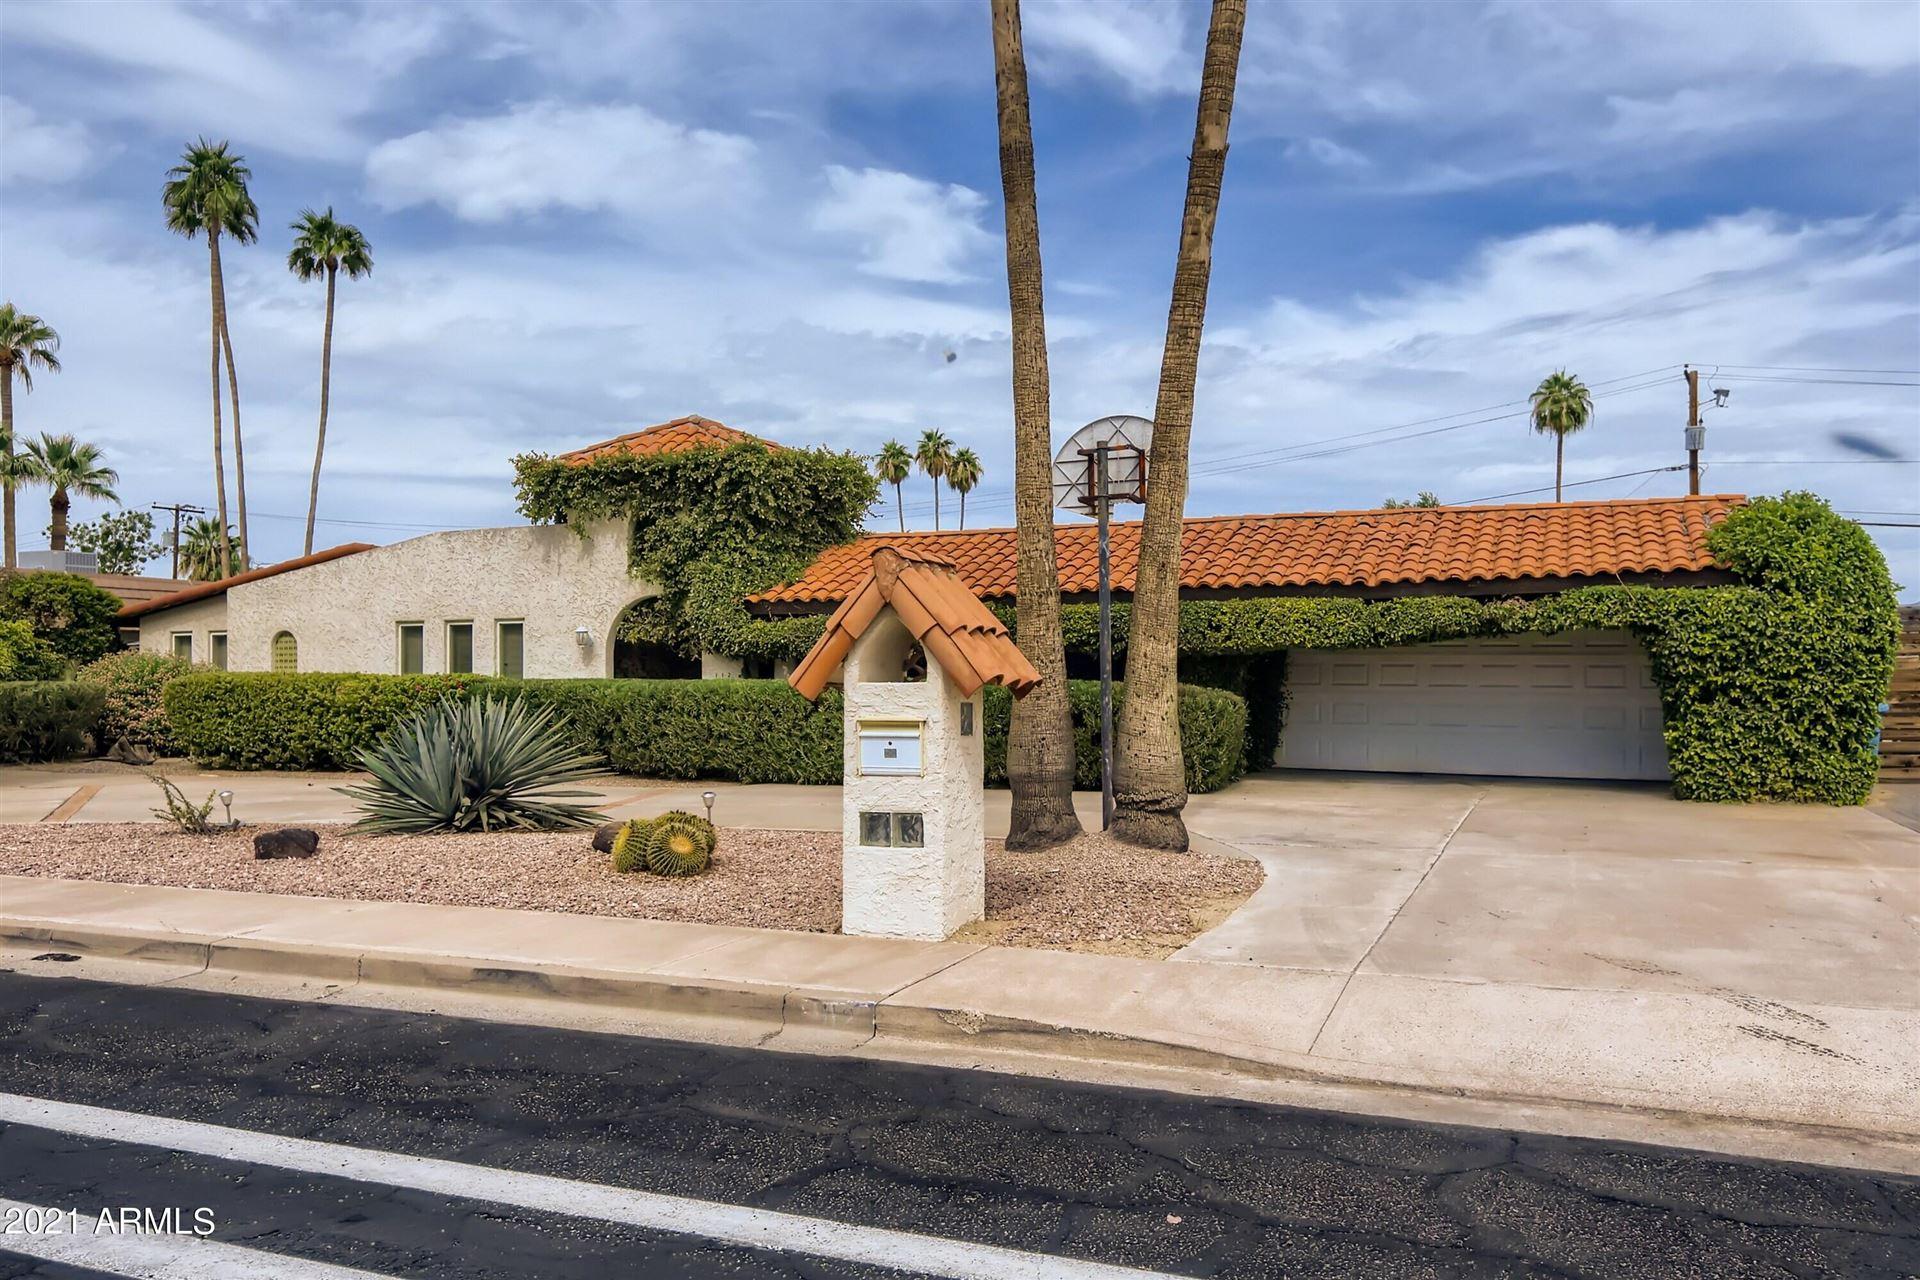 112 W MOON VALLEY Drive, Phoenix, AZ 85023 - MLS#: 6304712